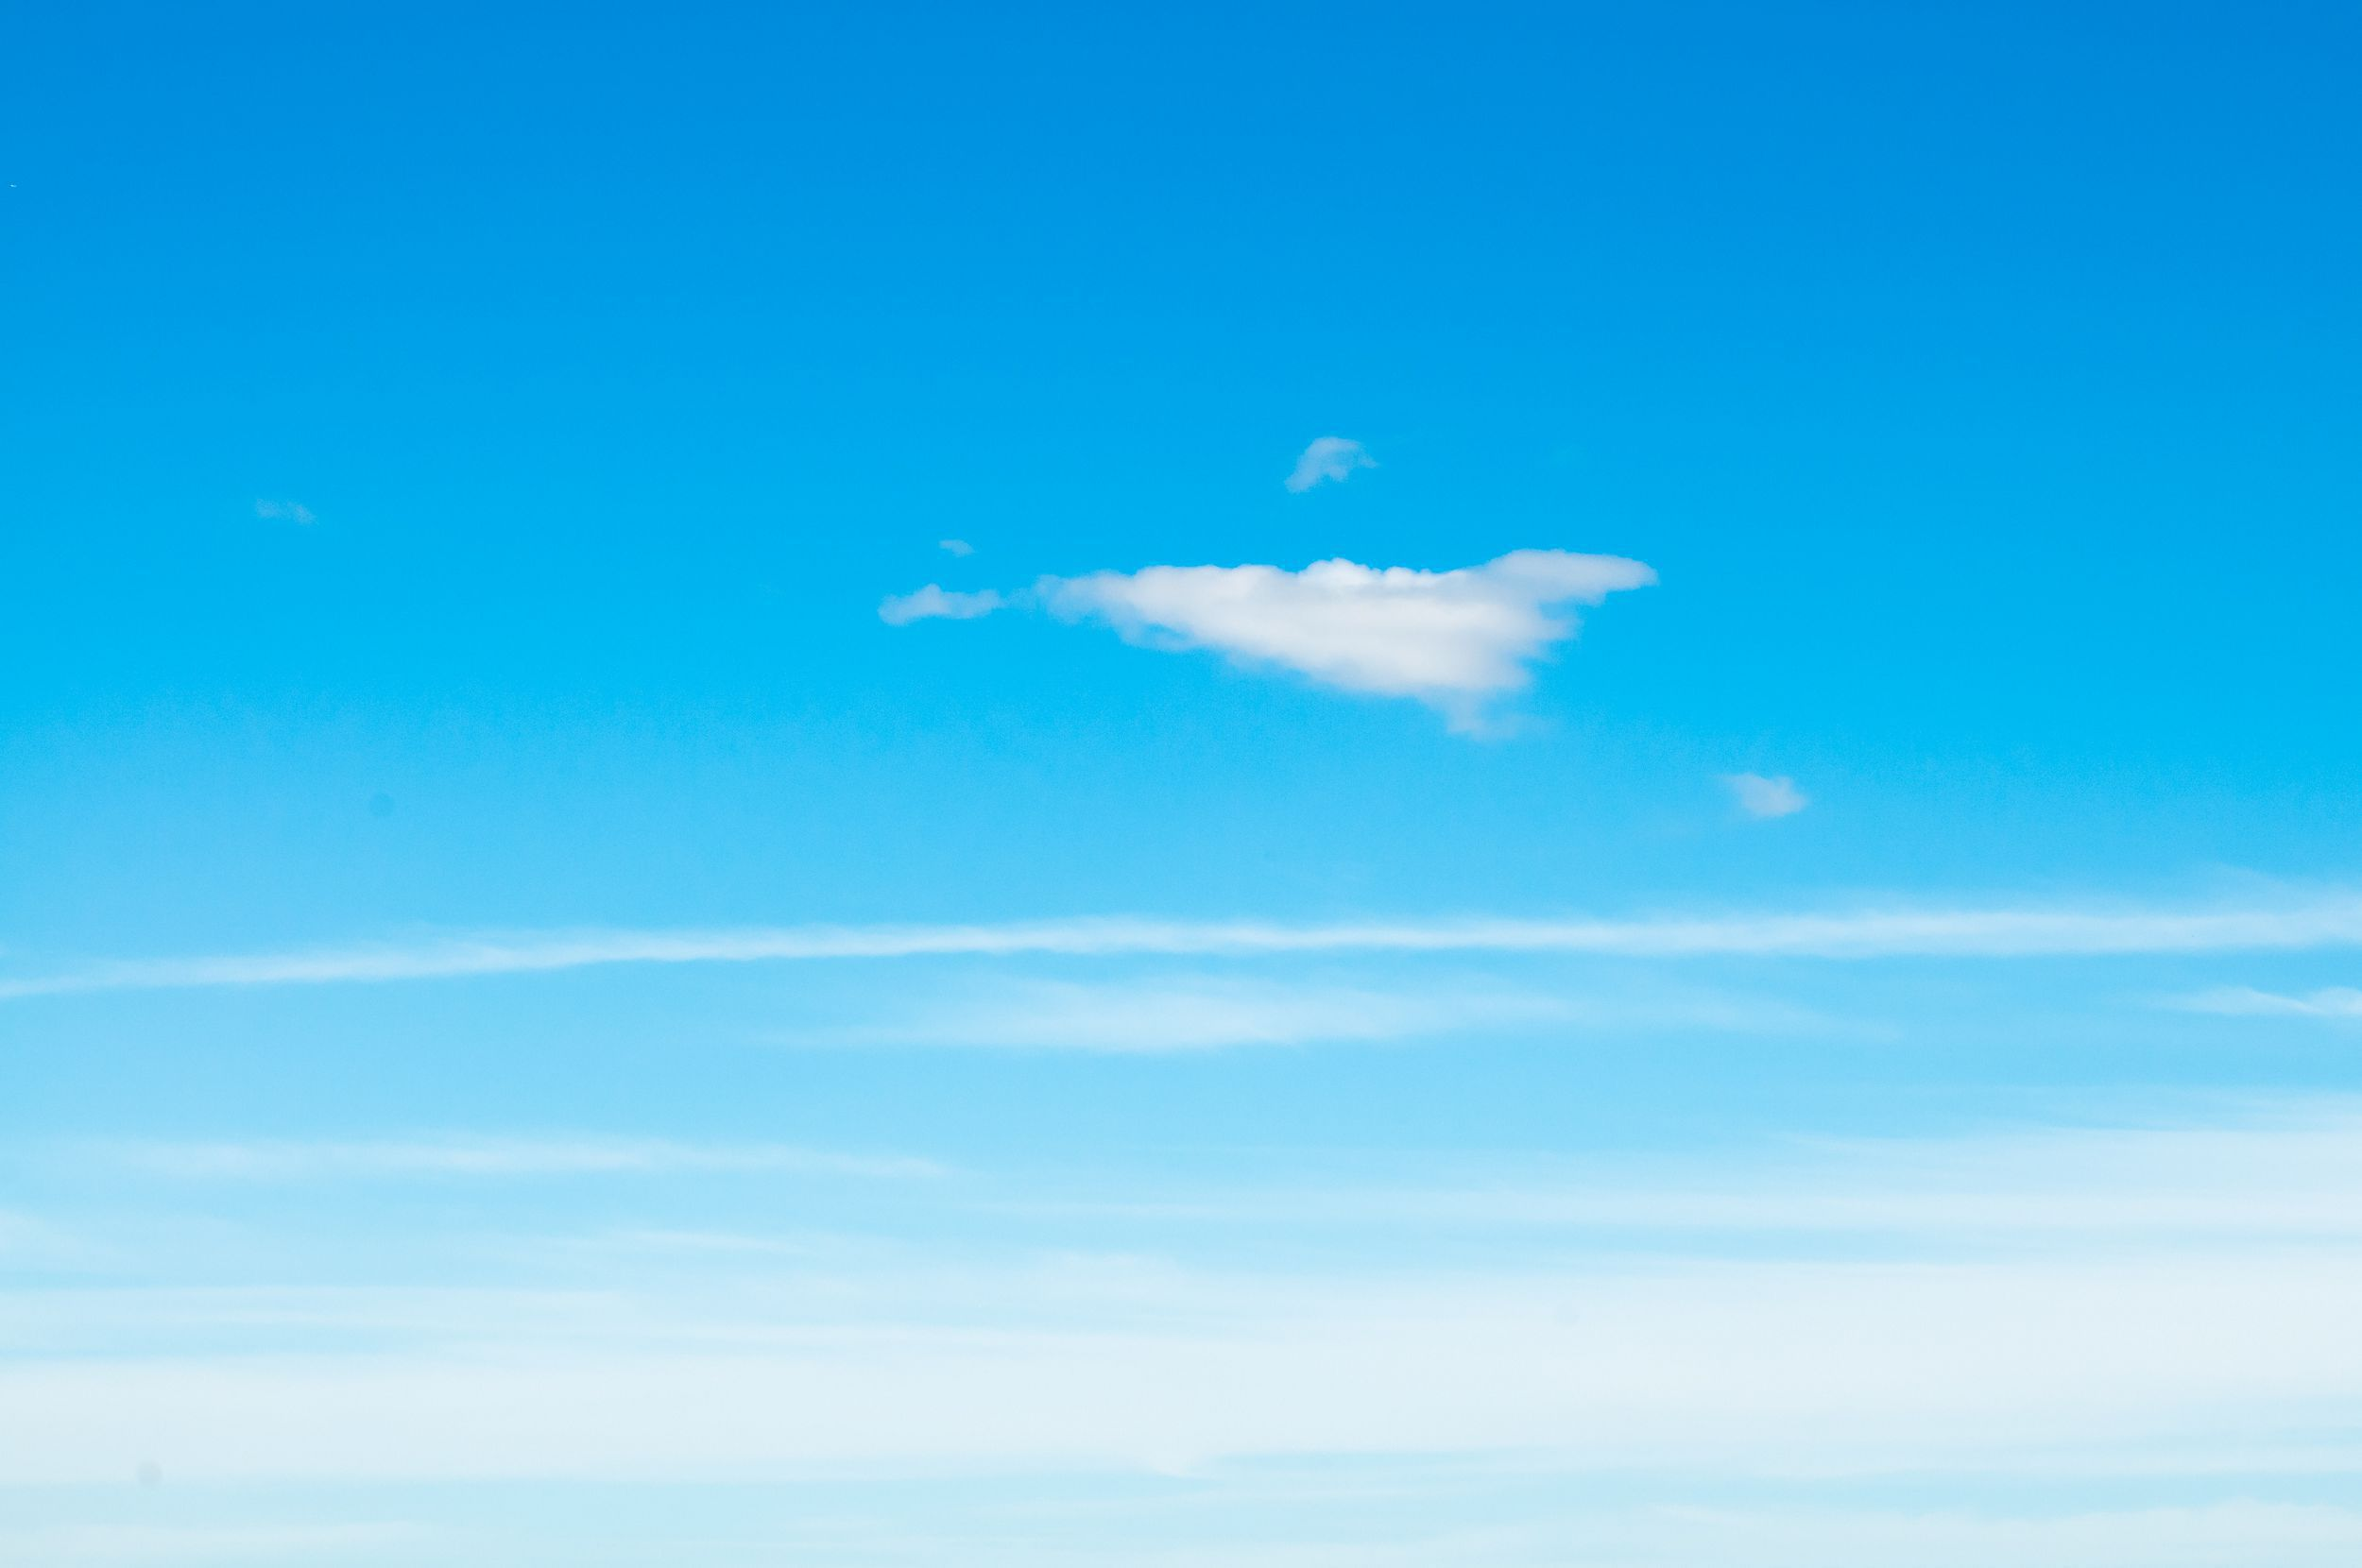 Scenic View Of Babysat Top Landscape Against Sky Stockfoto